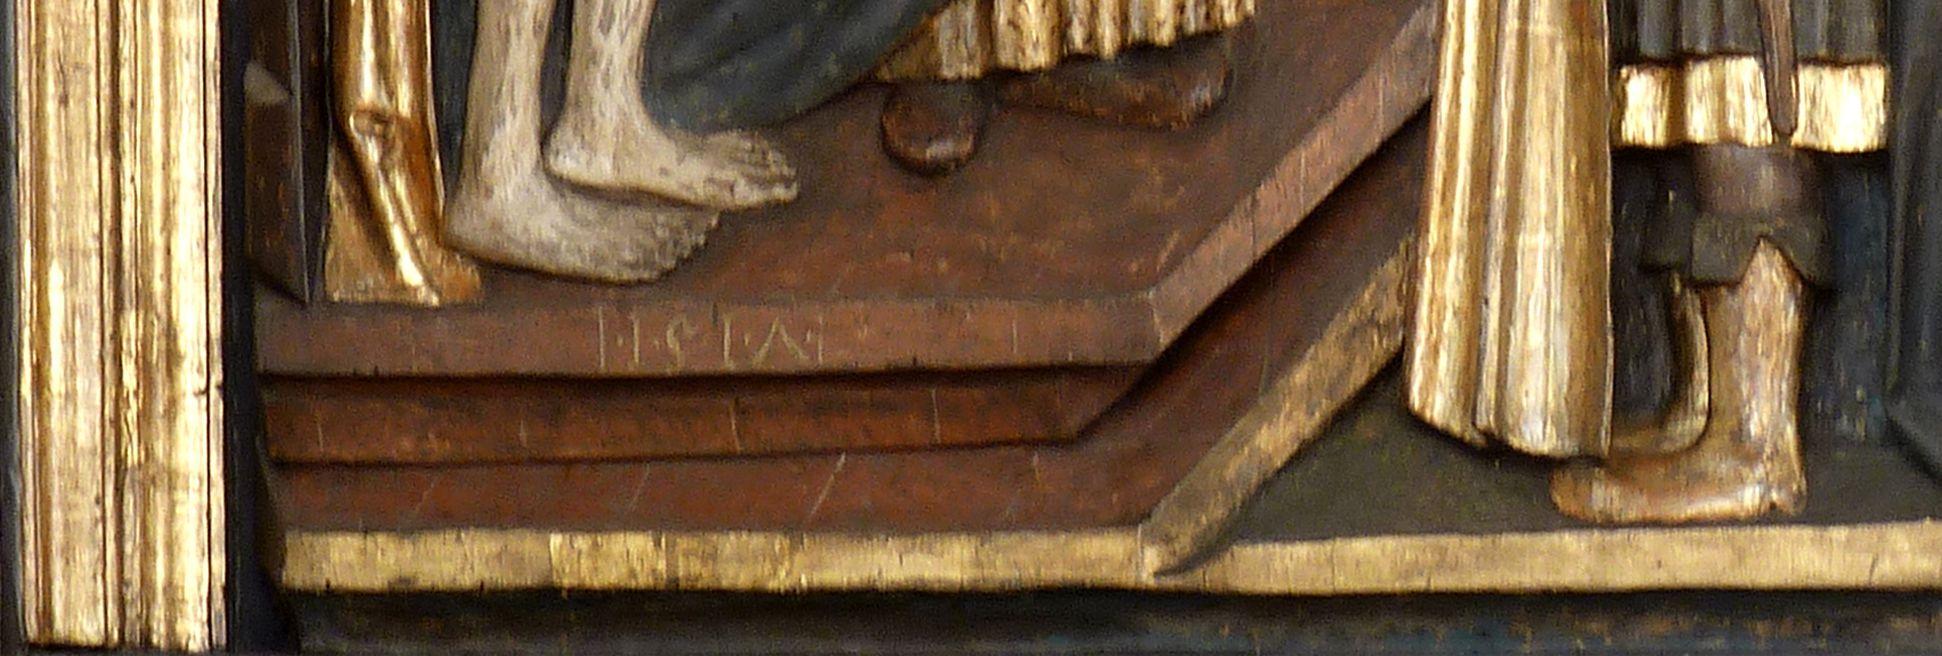 Kreuzaltar linker Flügel oben: Ecce homo, Datierung 1517